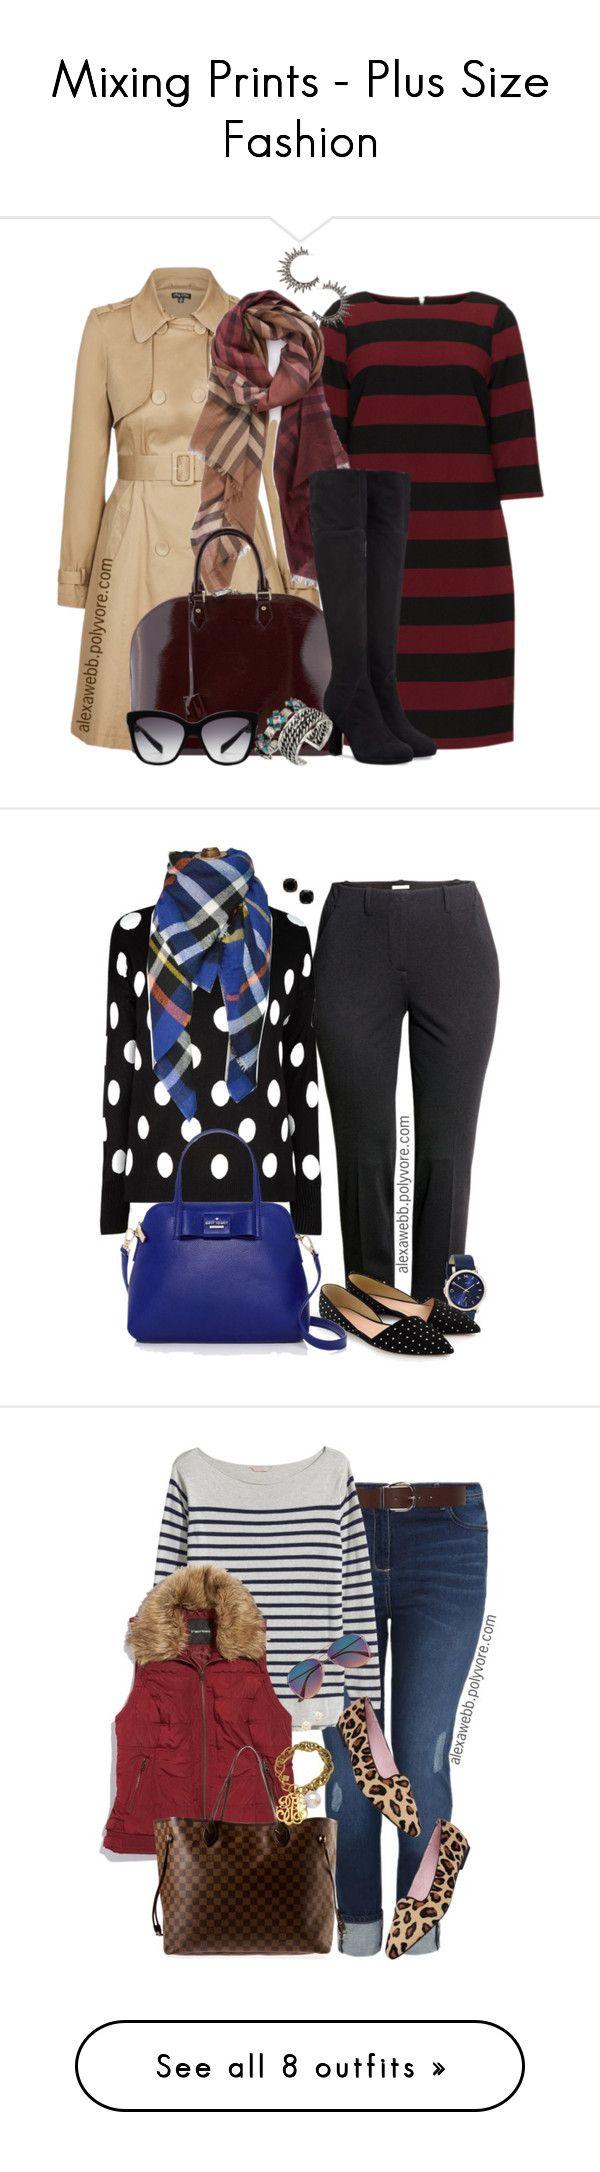 Mixing Prints - Plus Size Fashion by #alexawebb on Polyvore - http://www.alexawebb.com/the-new-neutrals-plus-size-fashion/